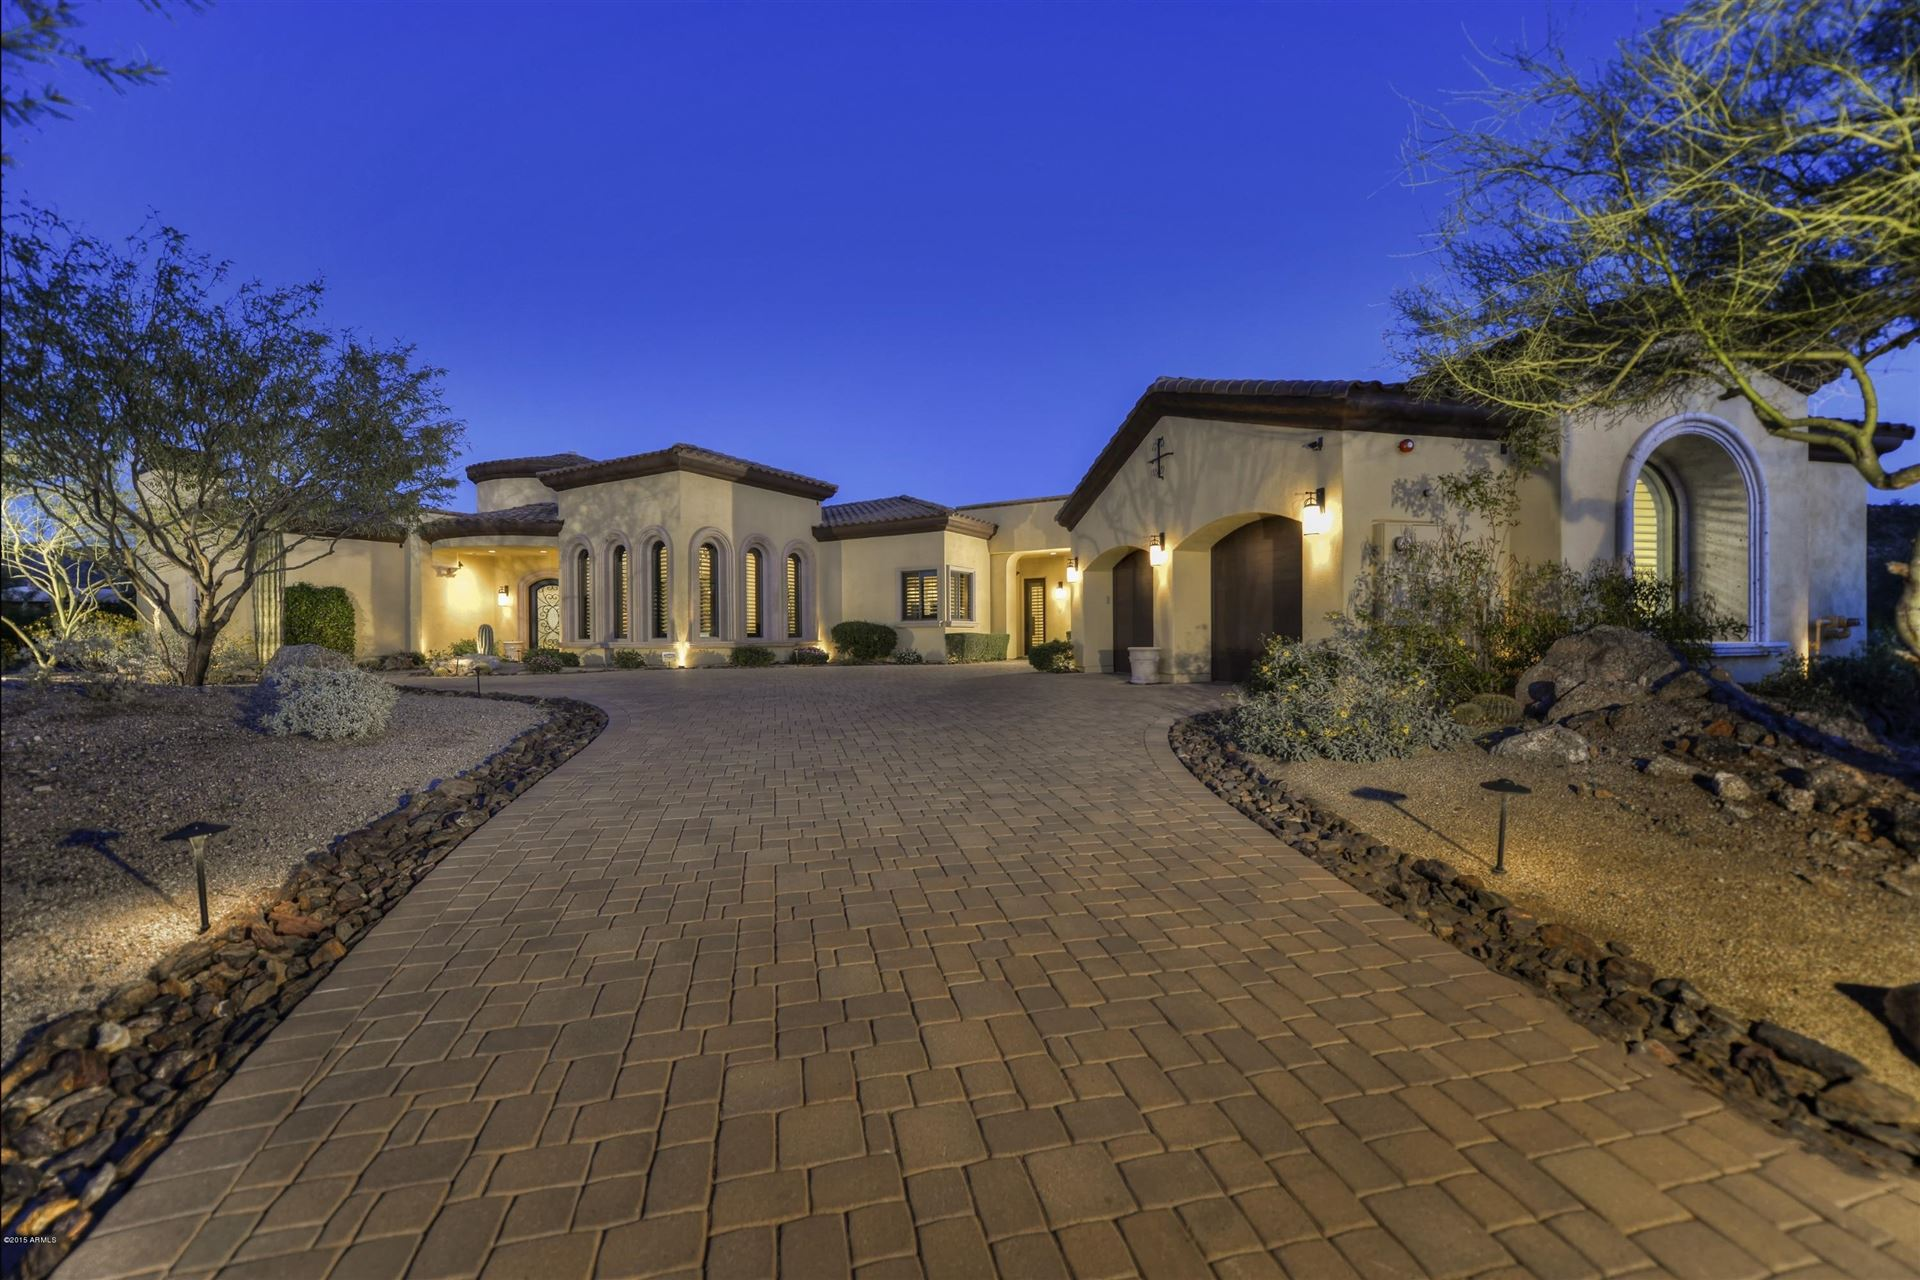 Photo of 3951 N PINNACLE HILLS Circle, Mesa, AZ 85207 (MLS # 6305455)